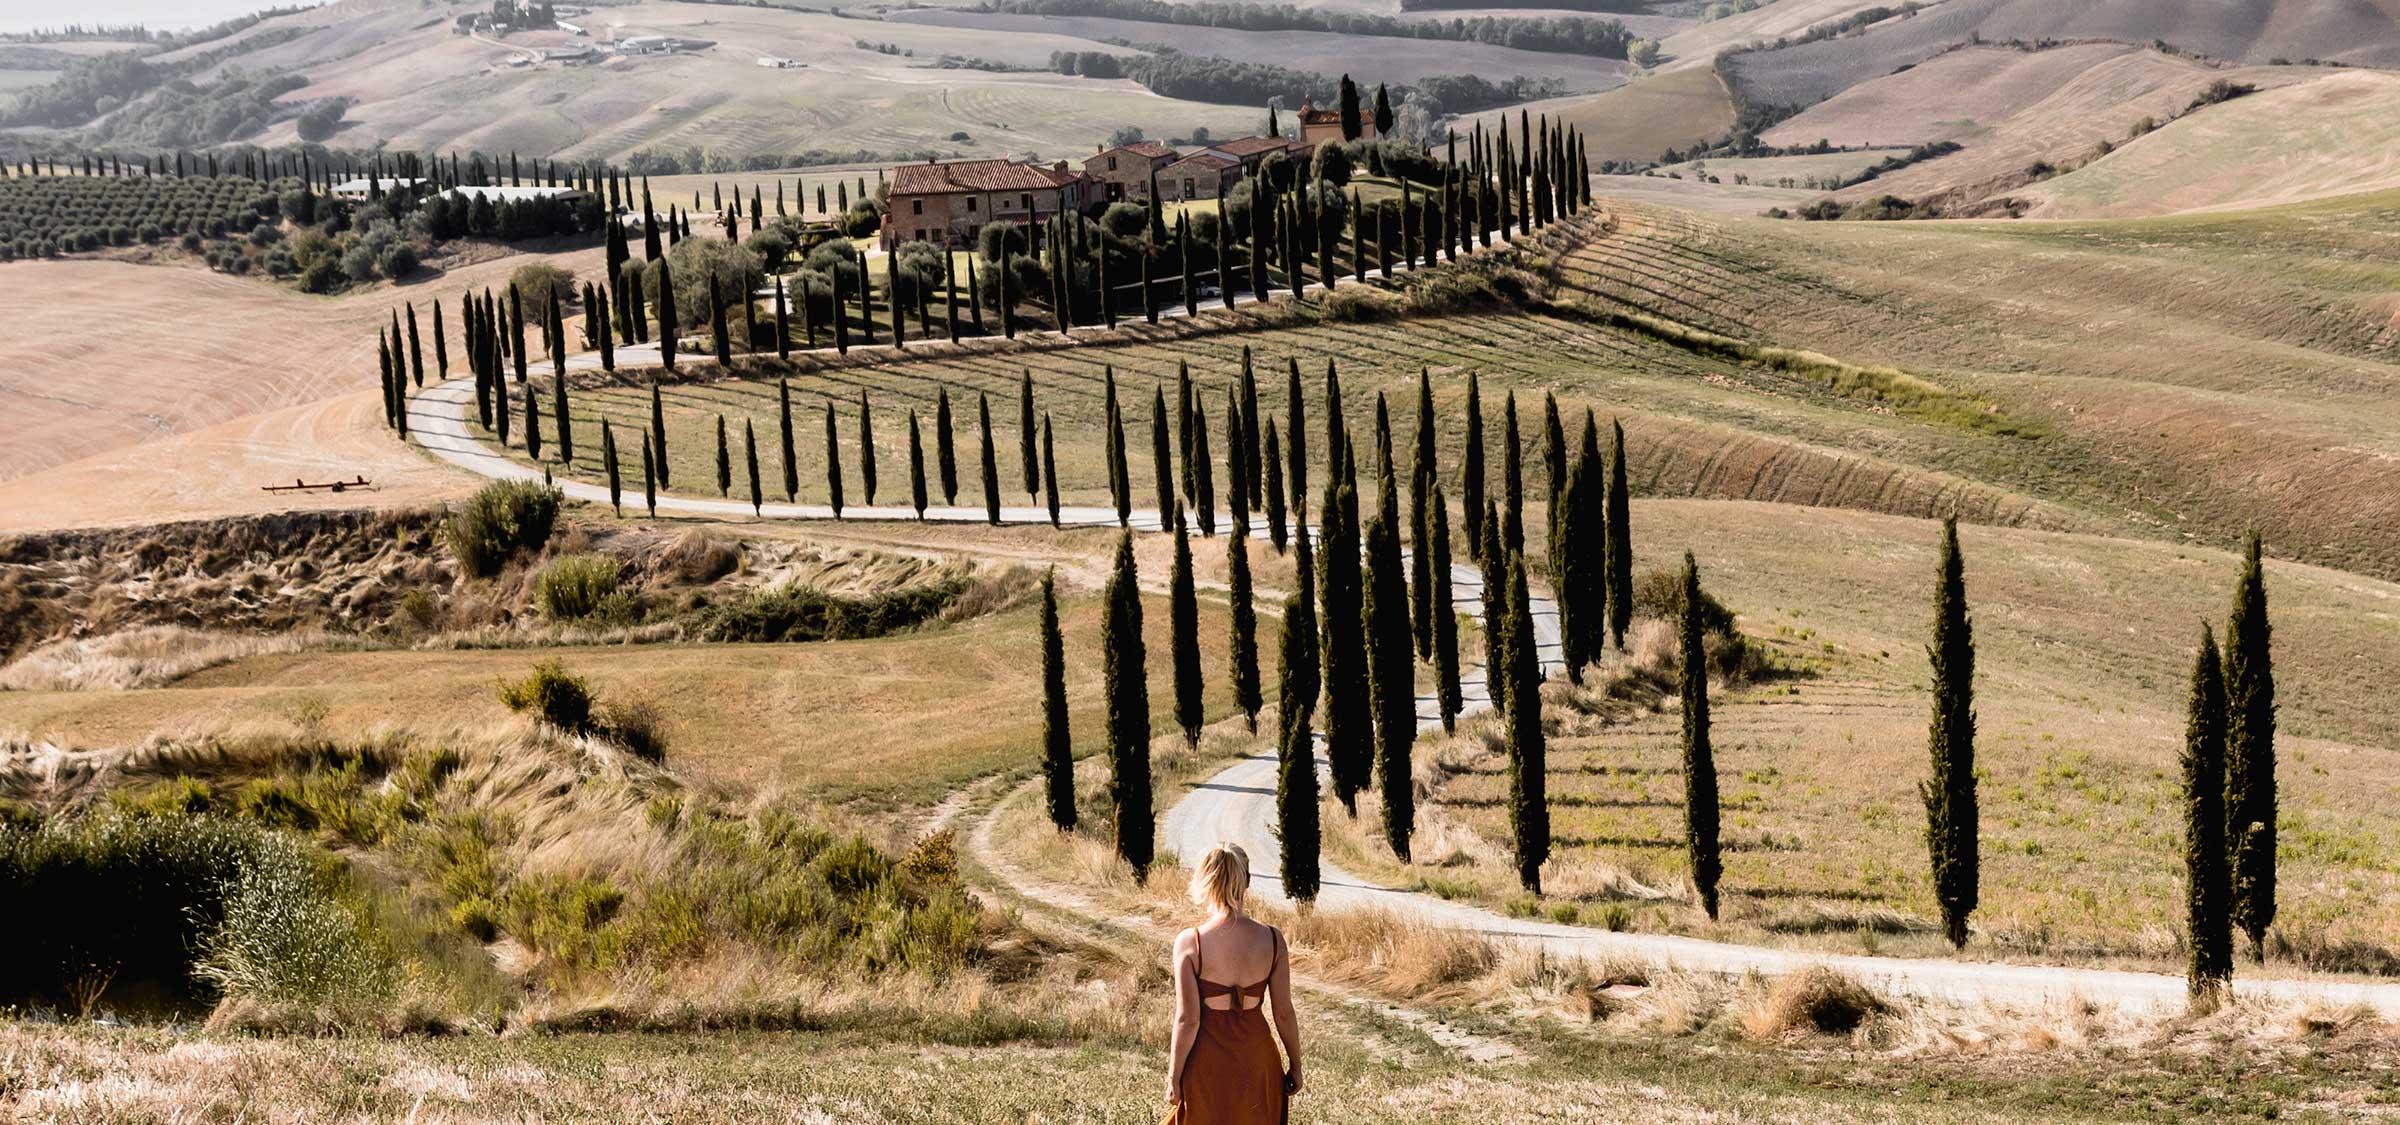 Wanderlust: Italy travel tips